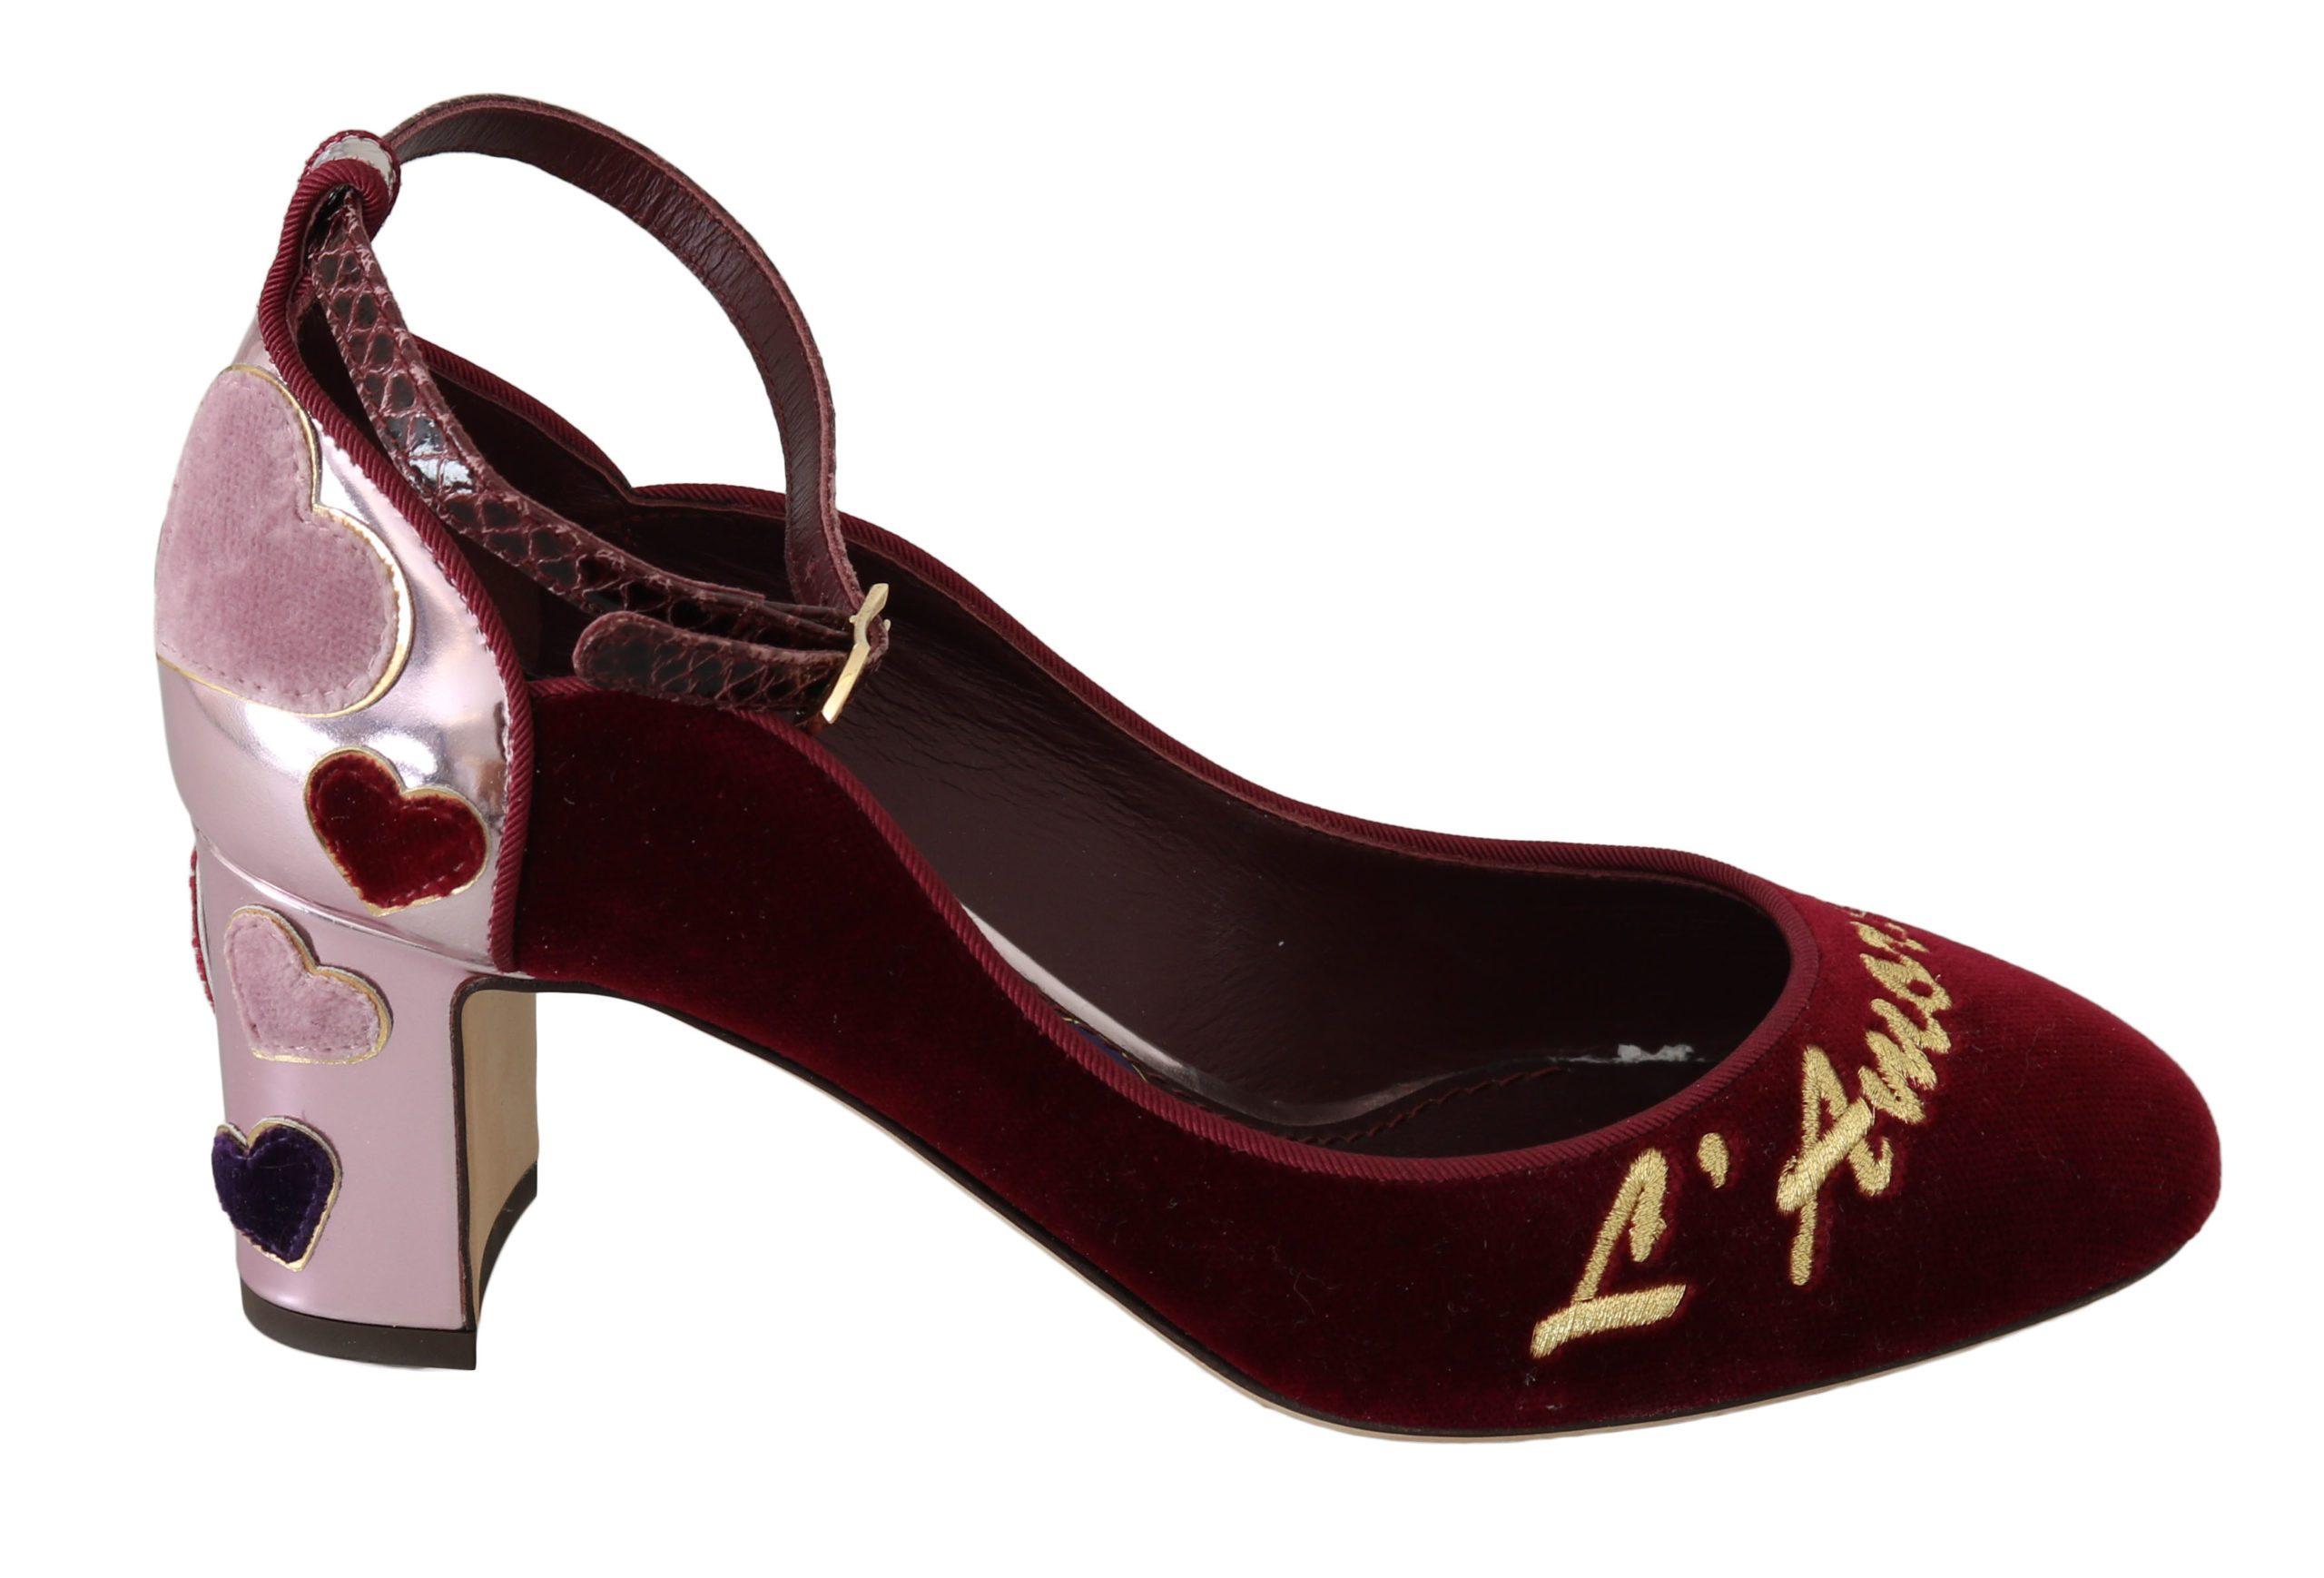 Dolce & Gabbana Women's Leather Hearts Heels Shoes Red LA6260 - EU35/US4.5